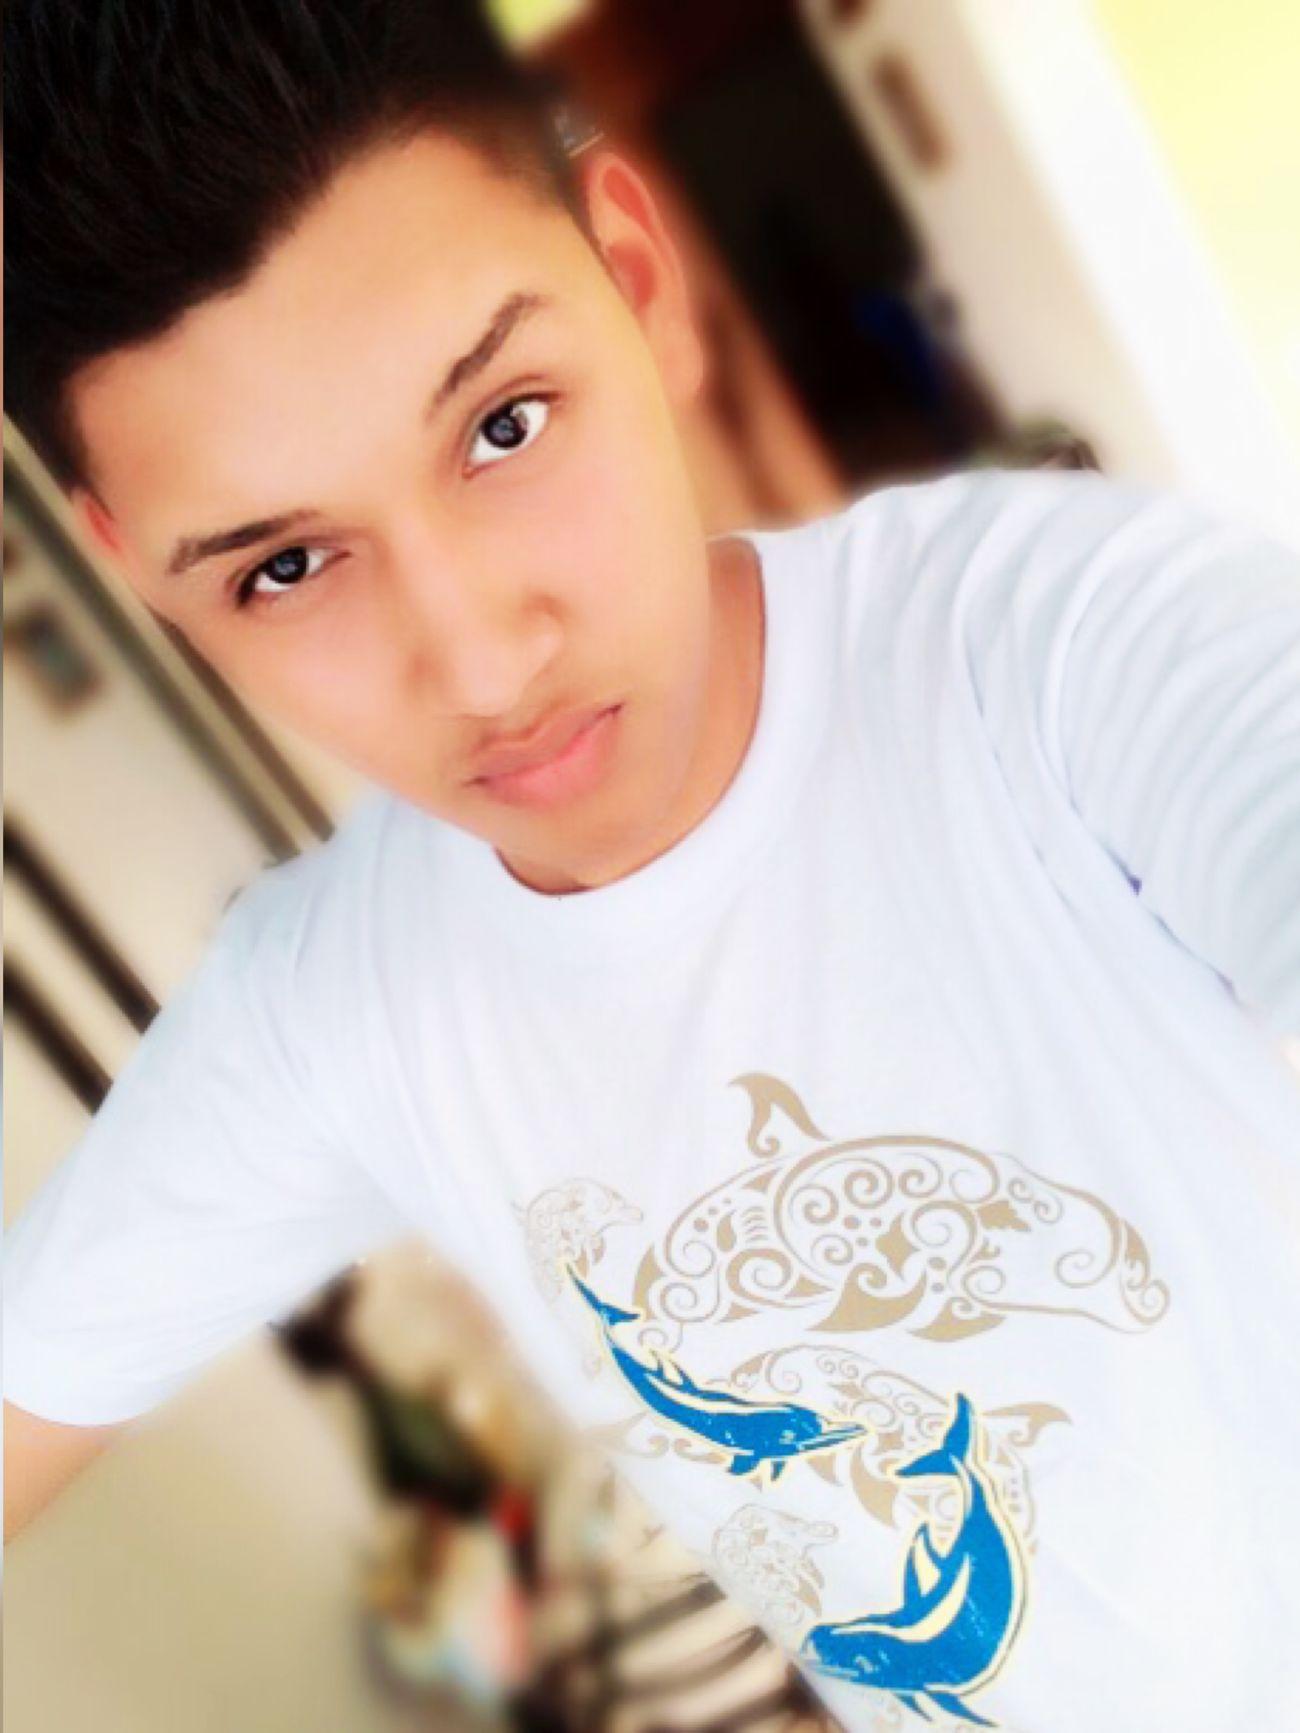 Hipster Today's Hot Look Handsome Boy Handsome😍 WilverGomez That's Me Selfie ✌ Followme Iphone5s Happy :)